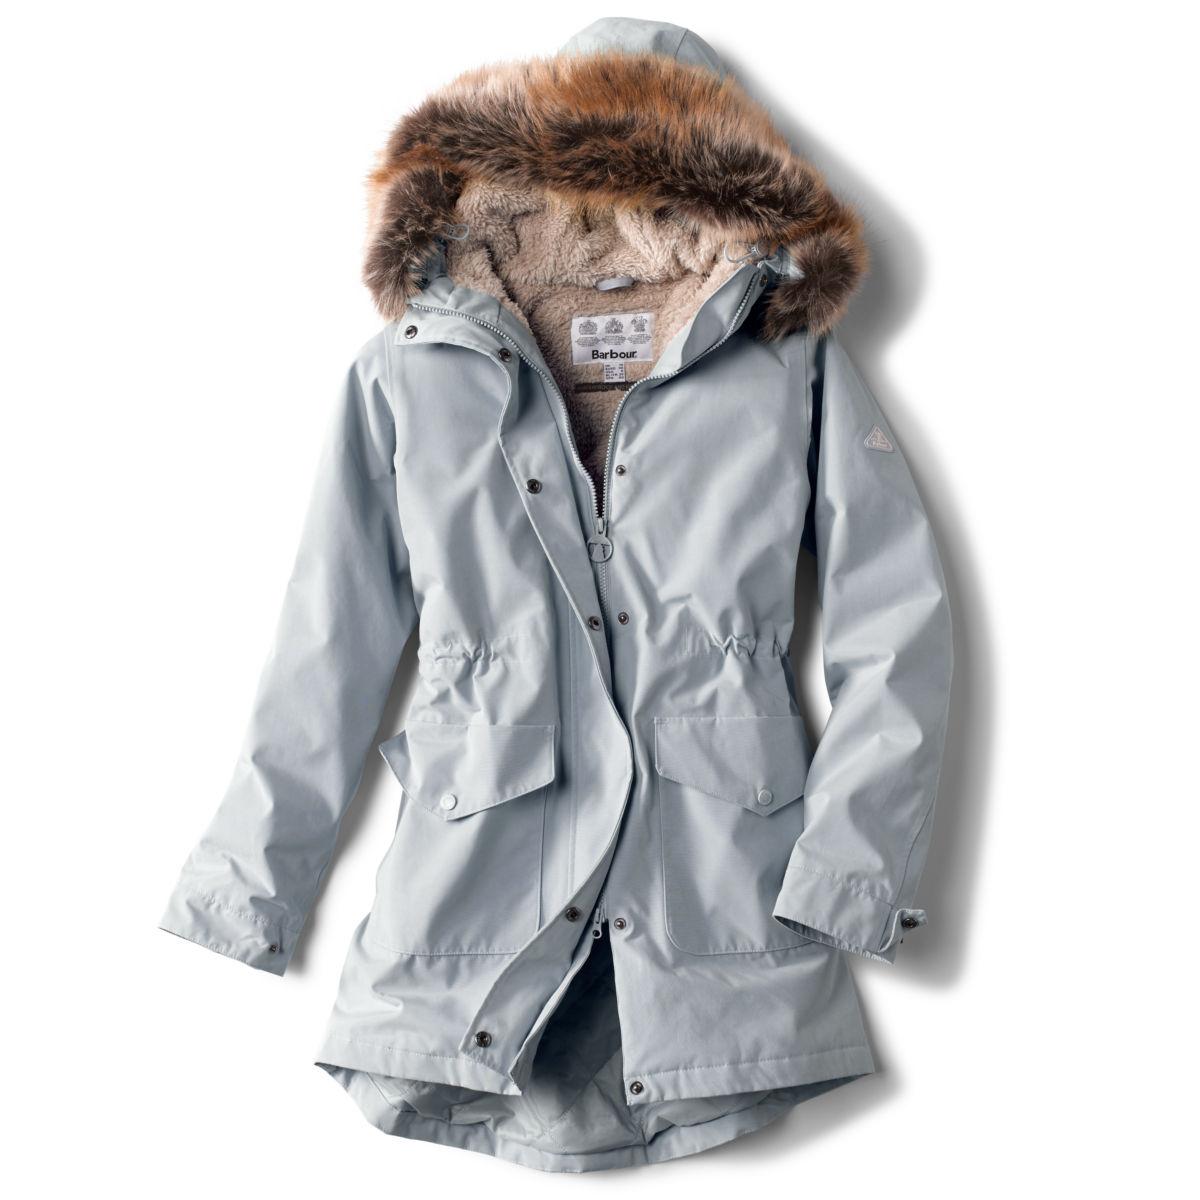 Barbour® Swanage Jacket - image number 0